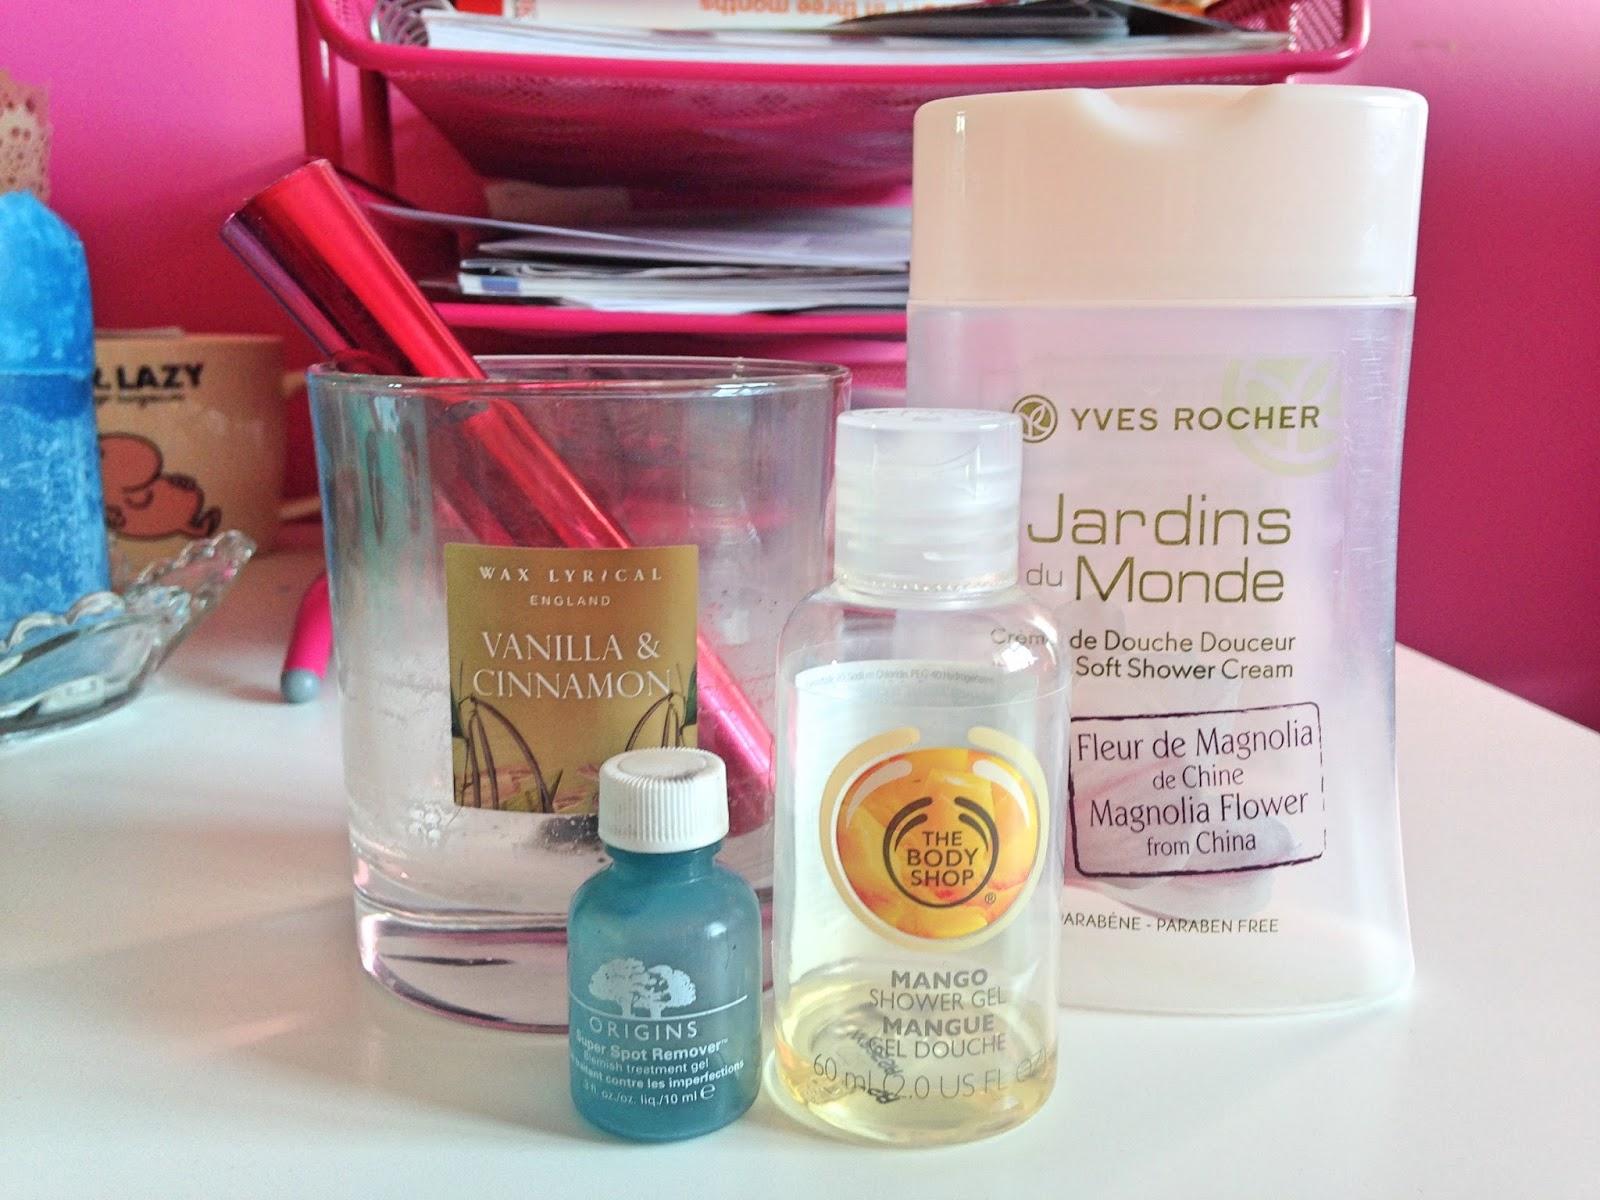 Wax Lyrical No7 Mascara The Body Shop Mango Shower Gel Yves Rocher Jardins de Monde Origins Super Spot Remover